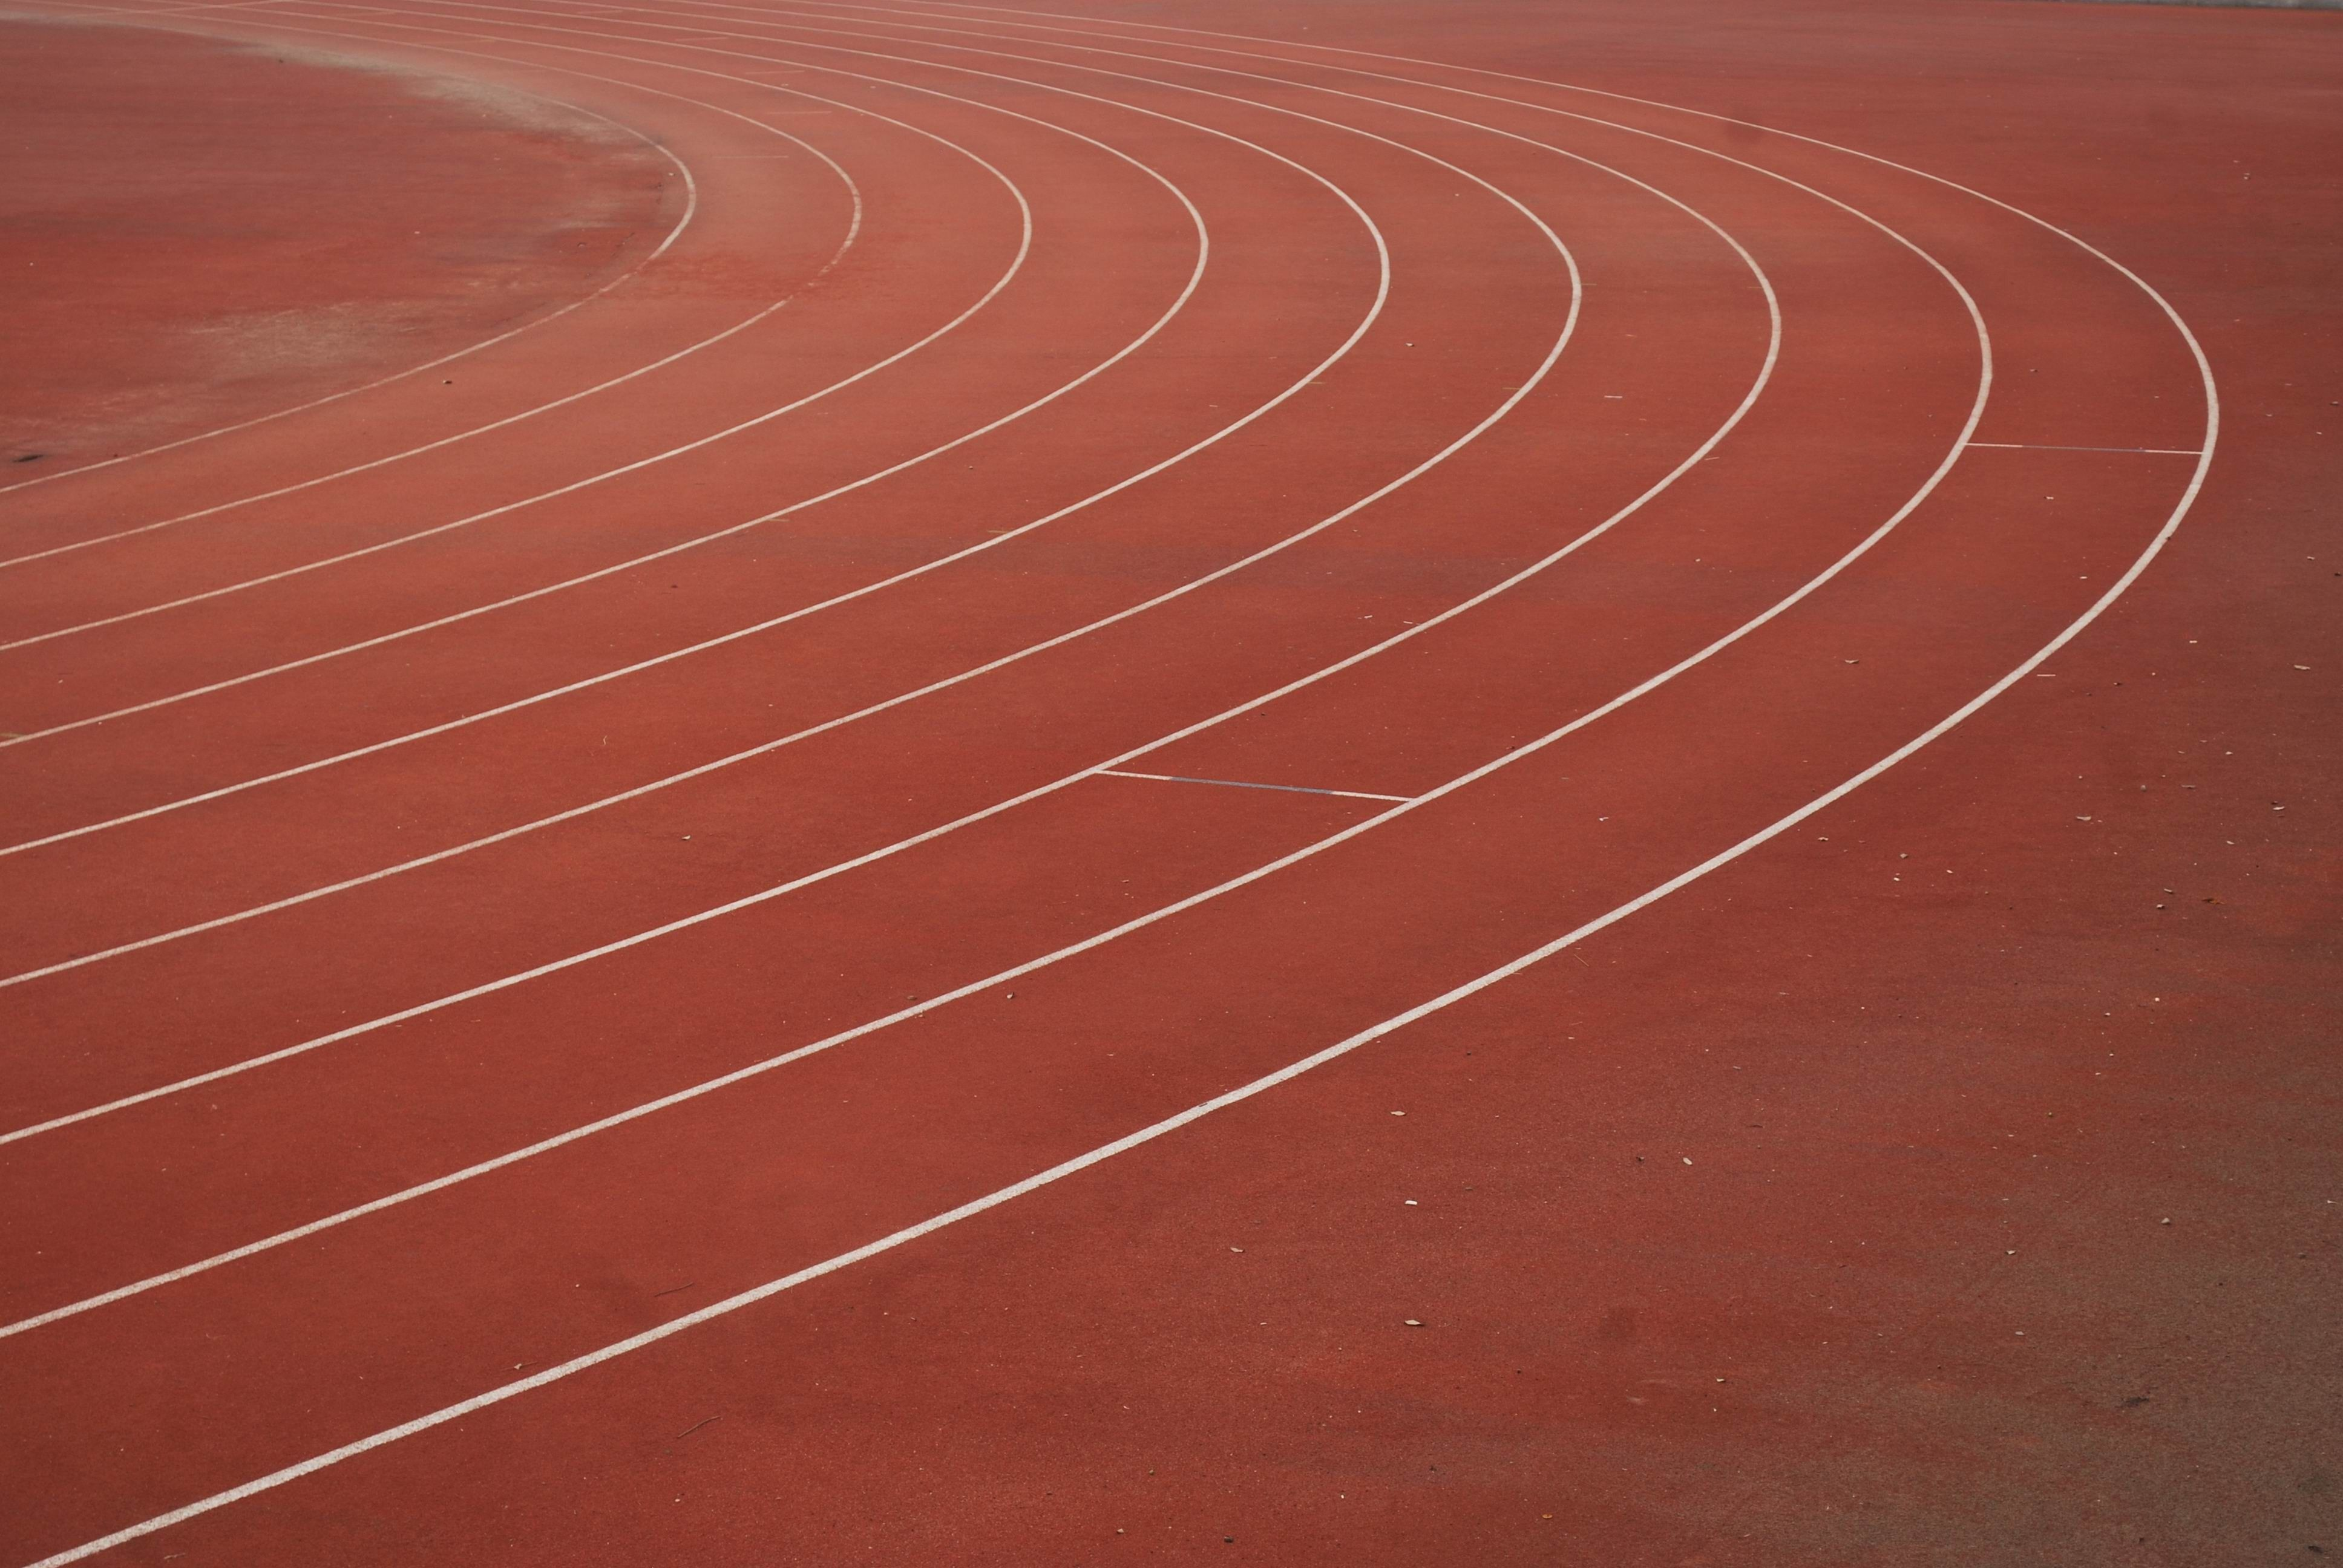 track-19217